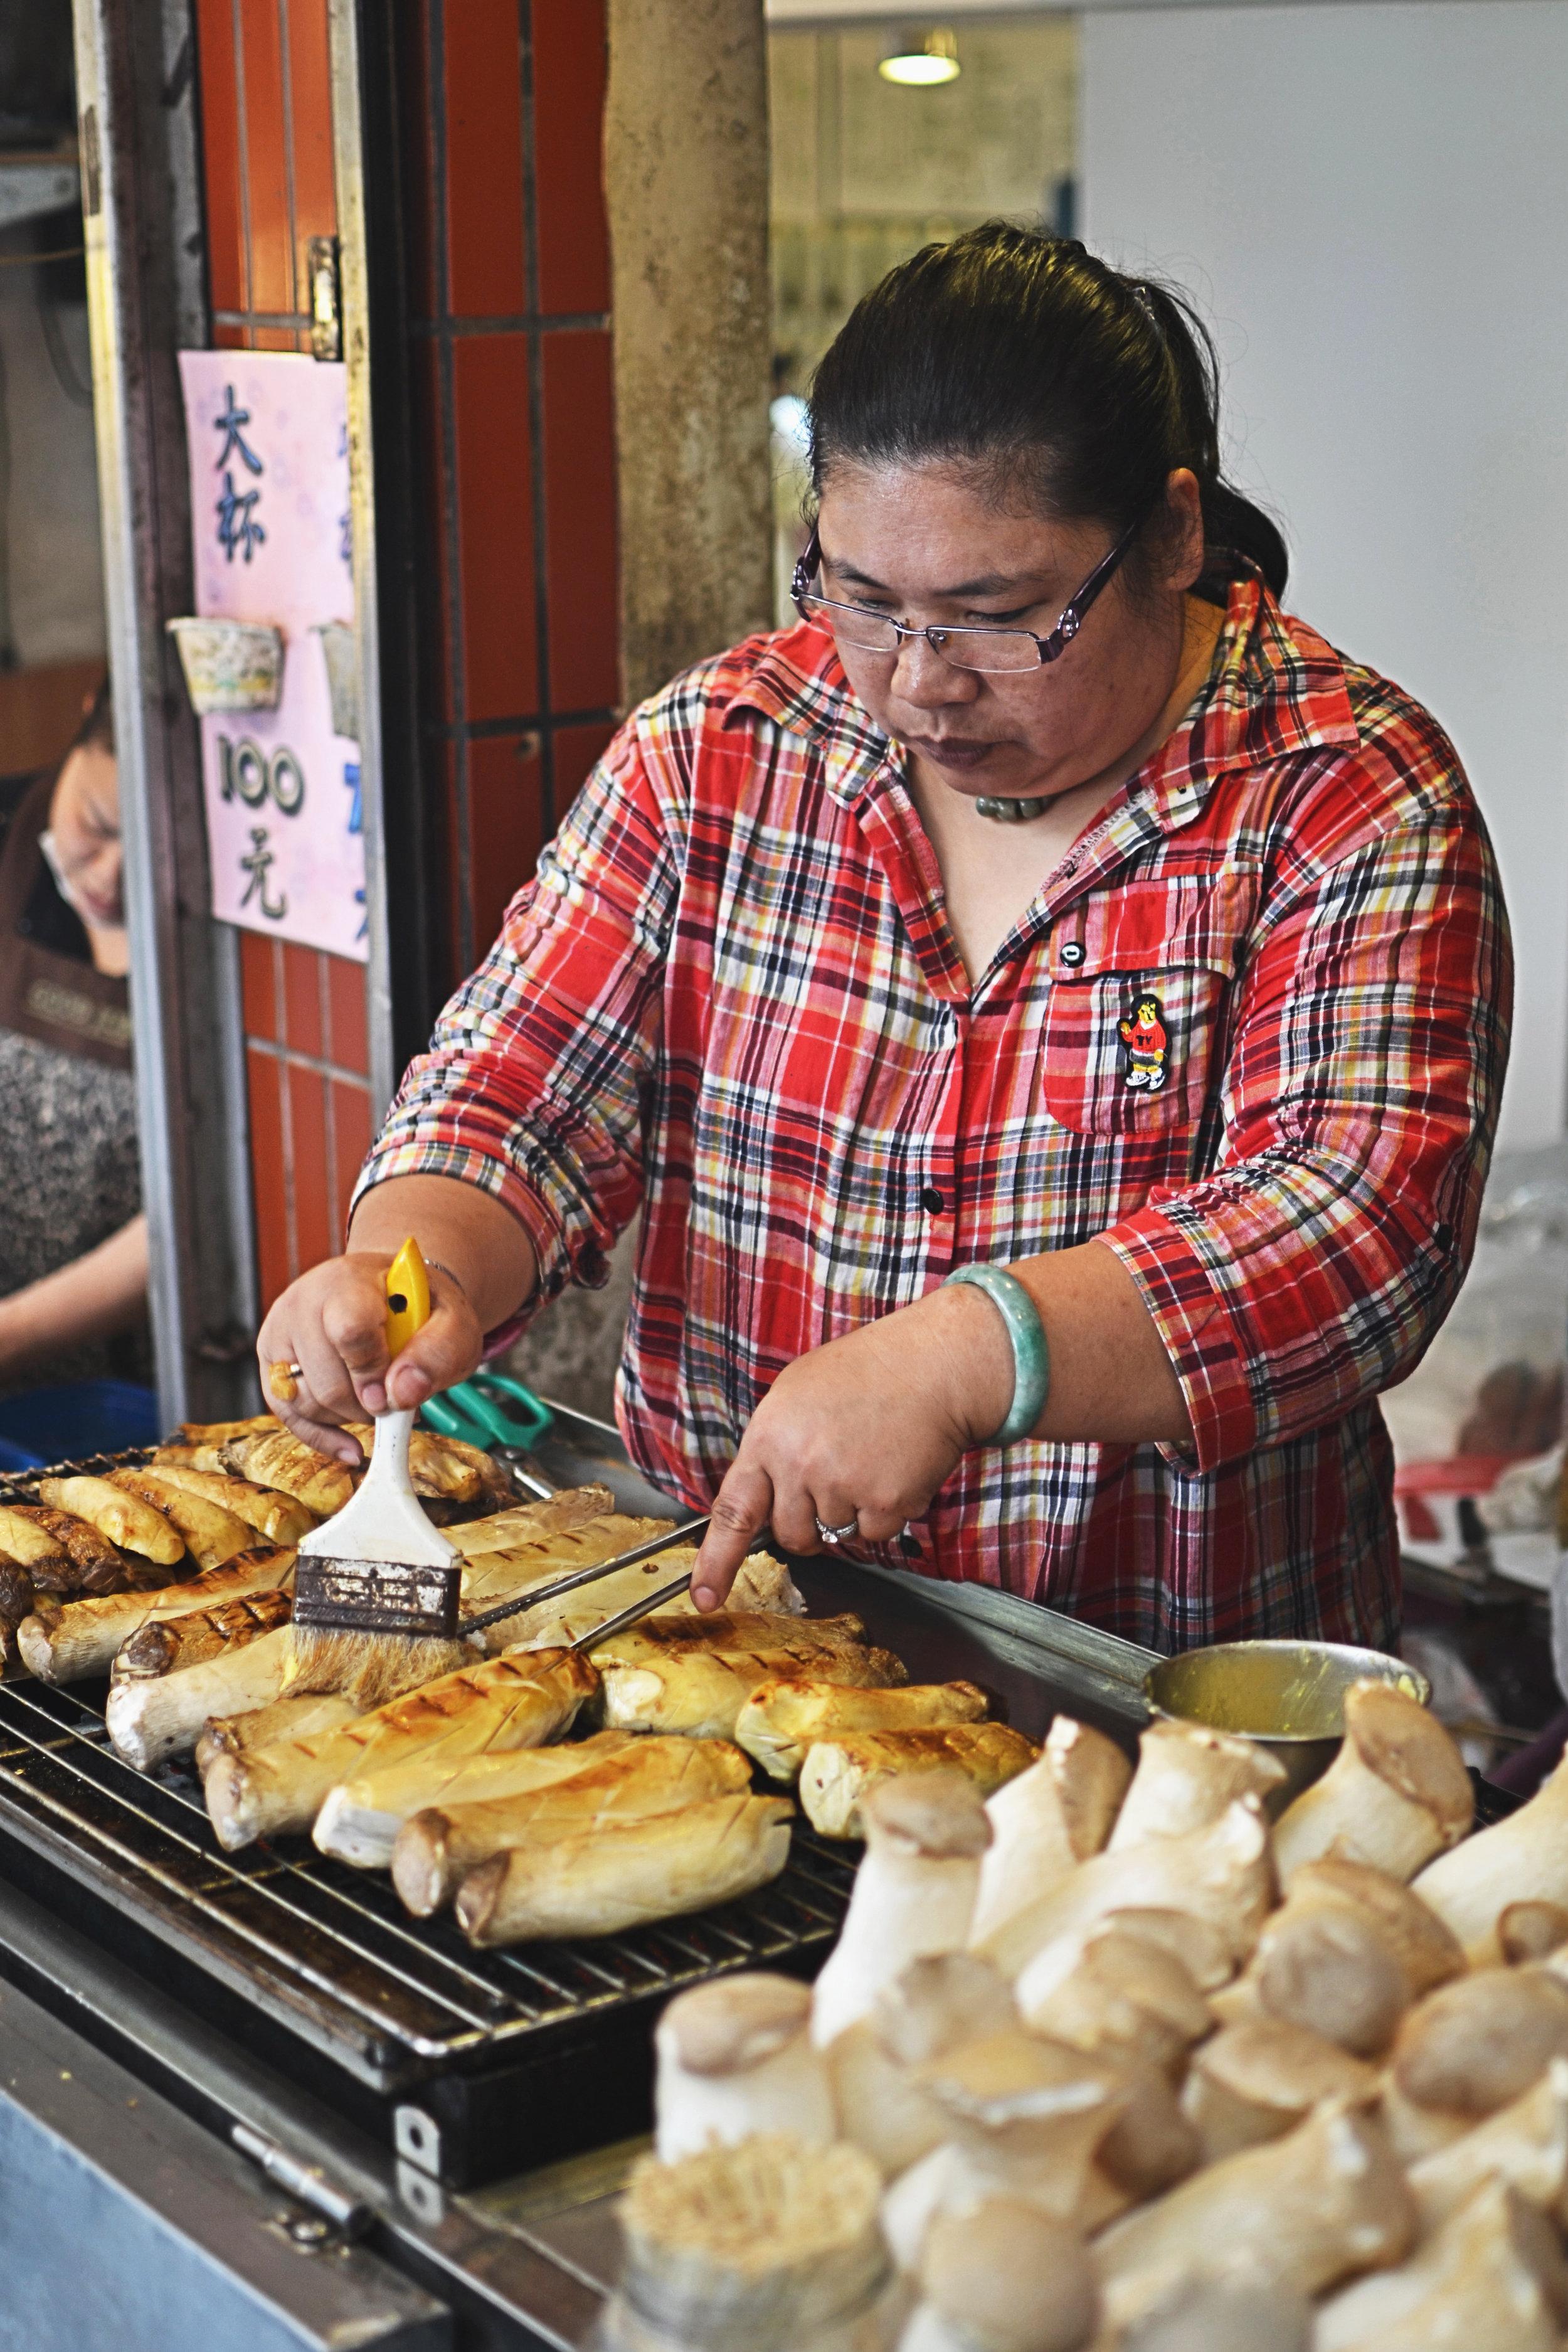 A woman grilling mushrooms at Jiufen, Taiwan